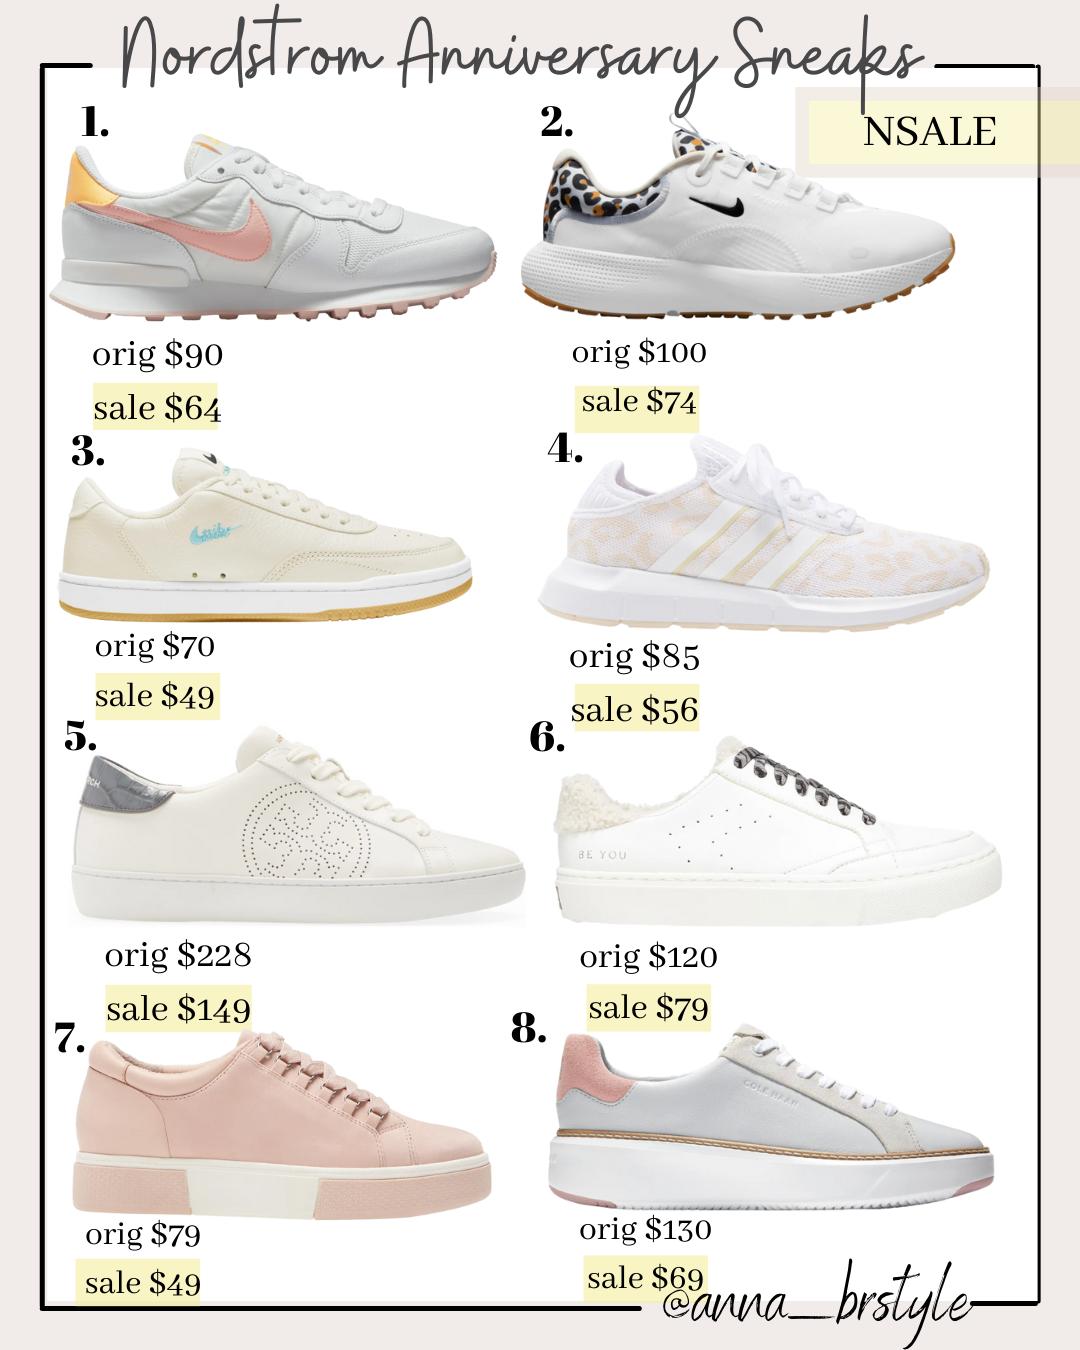 nsale sneakers